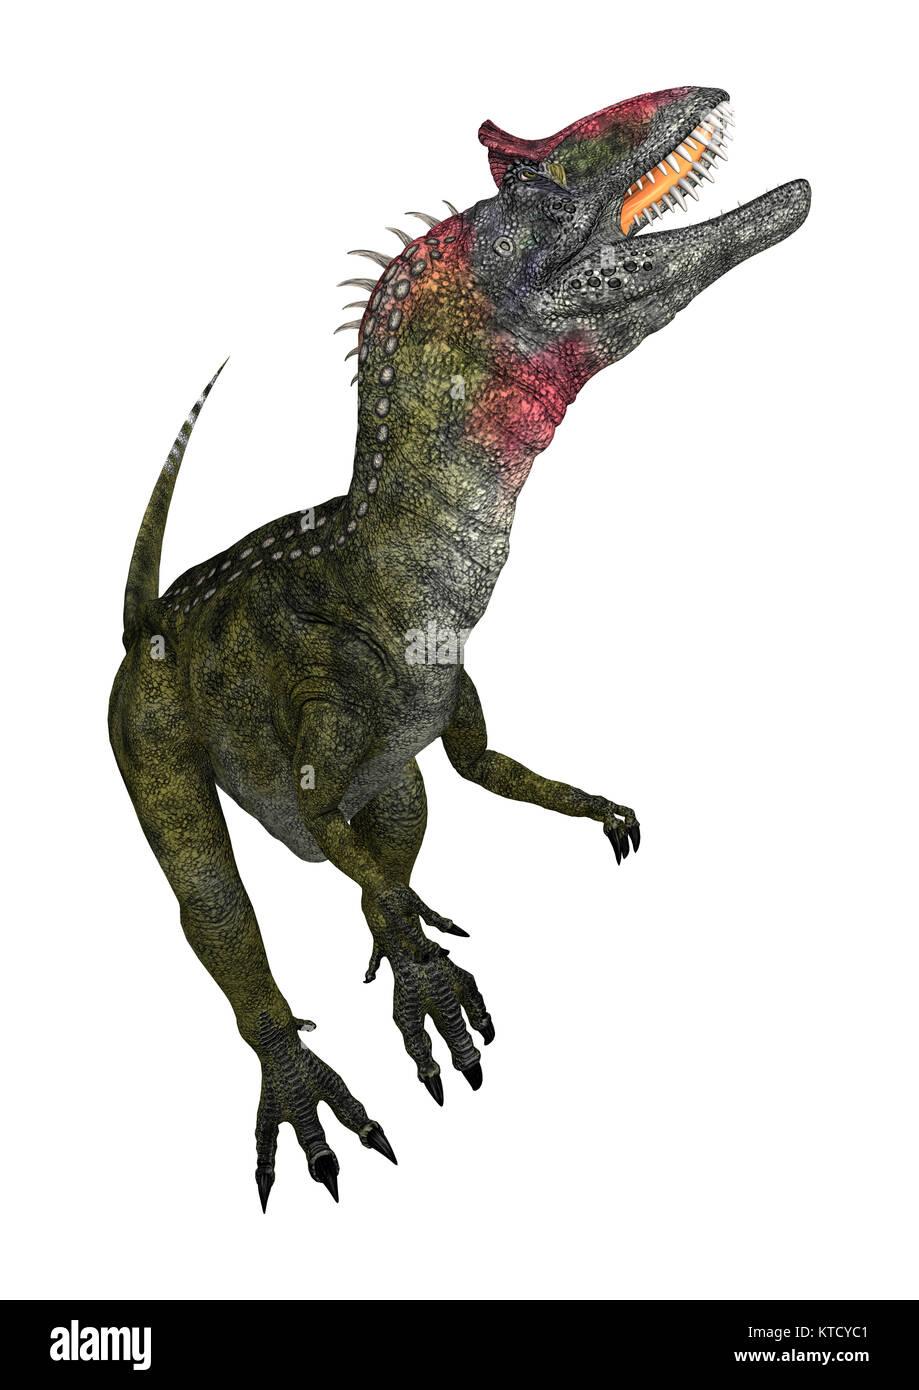 3D Rendering Dinosaur Cryolophosaurus on White - Stock Image